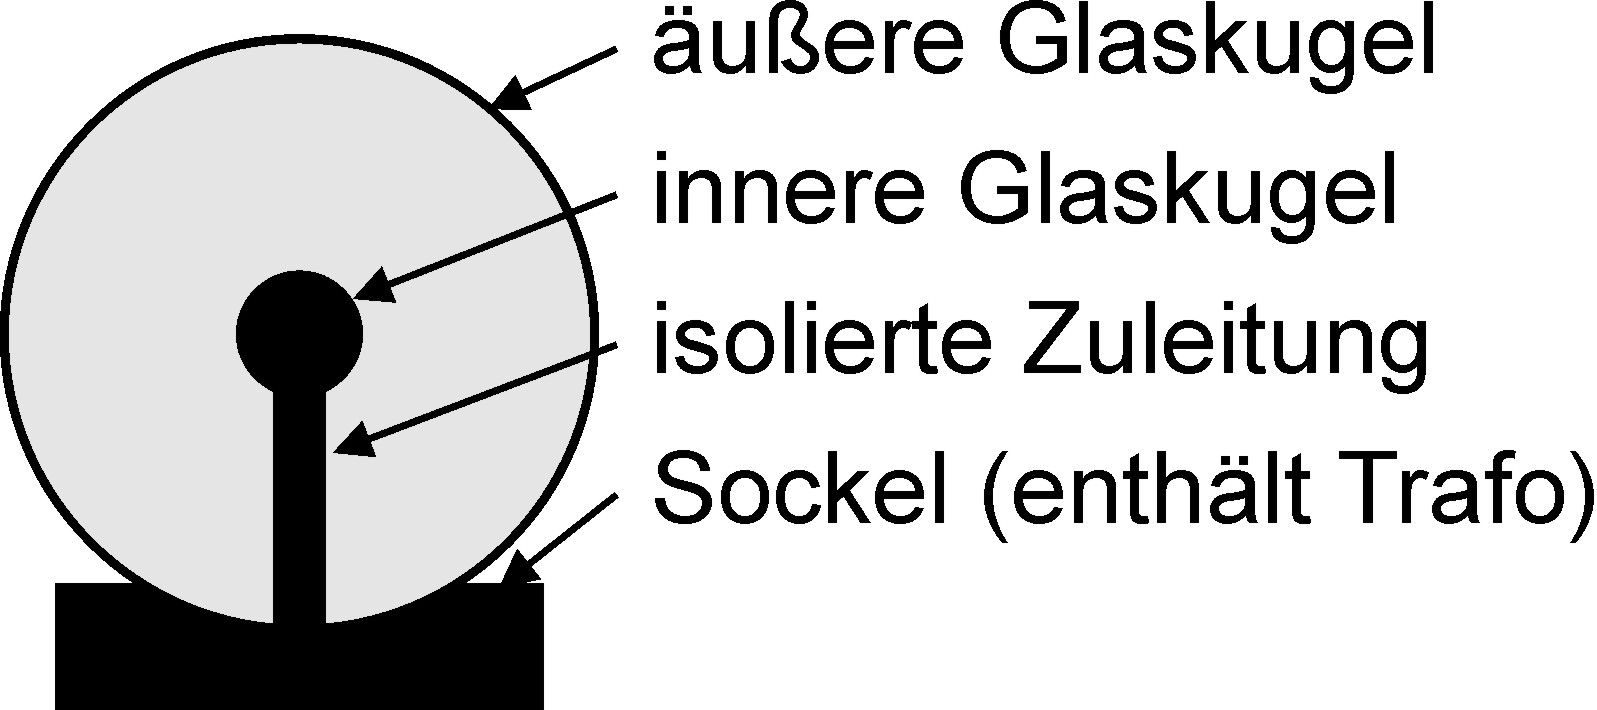 Die Plasmakugel Formbar Scilogs Wissenschaftsblogs Wiring Diagram For Sdtech Light Bars